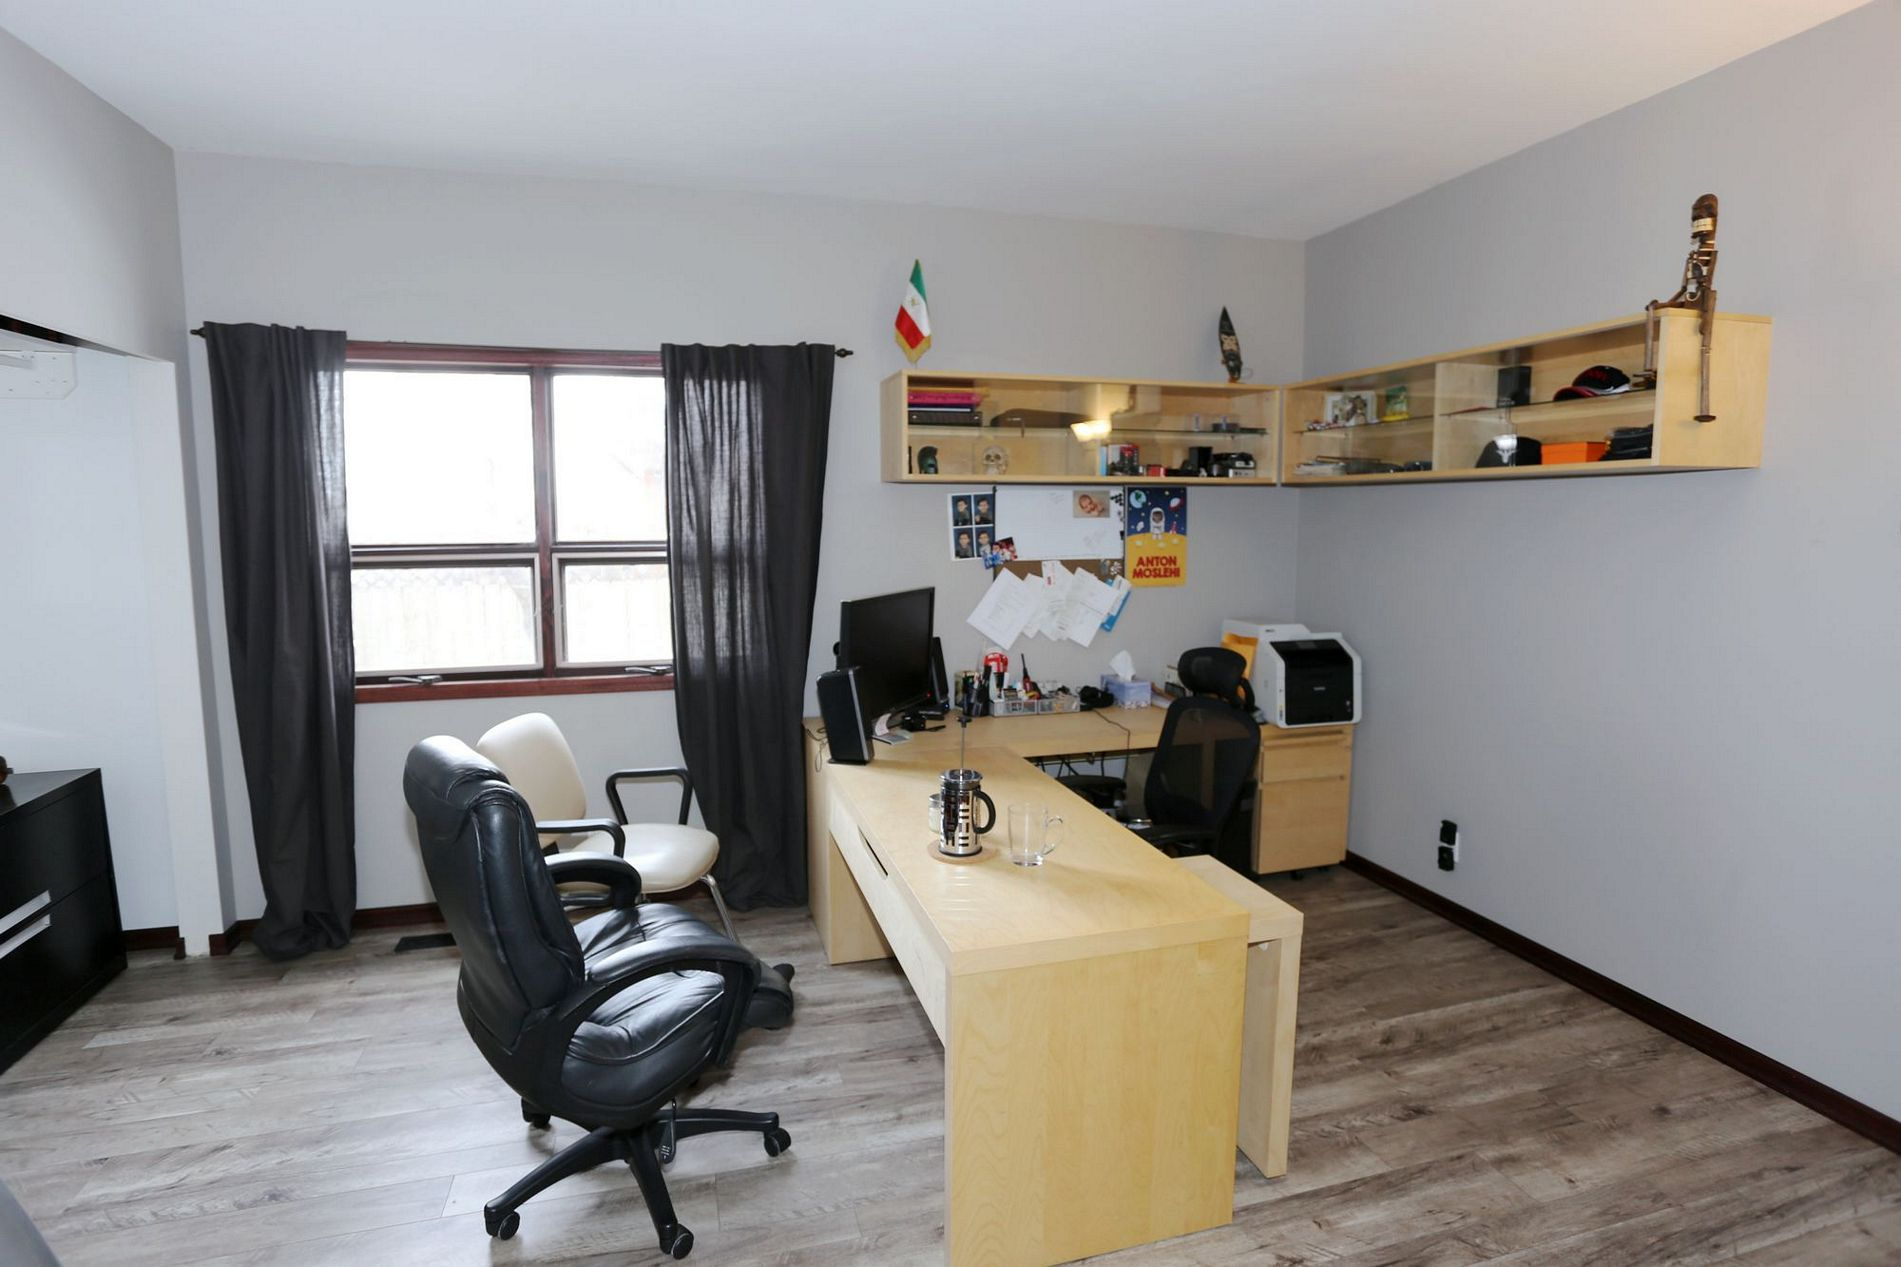 462 Bredin Drive, Winnipeg, Manitoba  R2K 1N6 - Photo 3 - 1706489